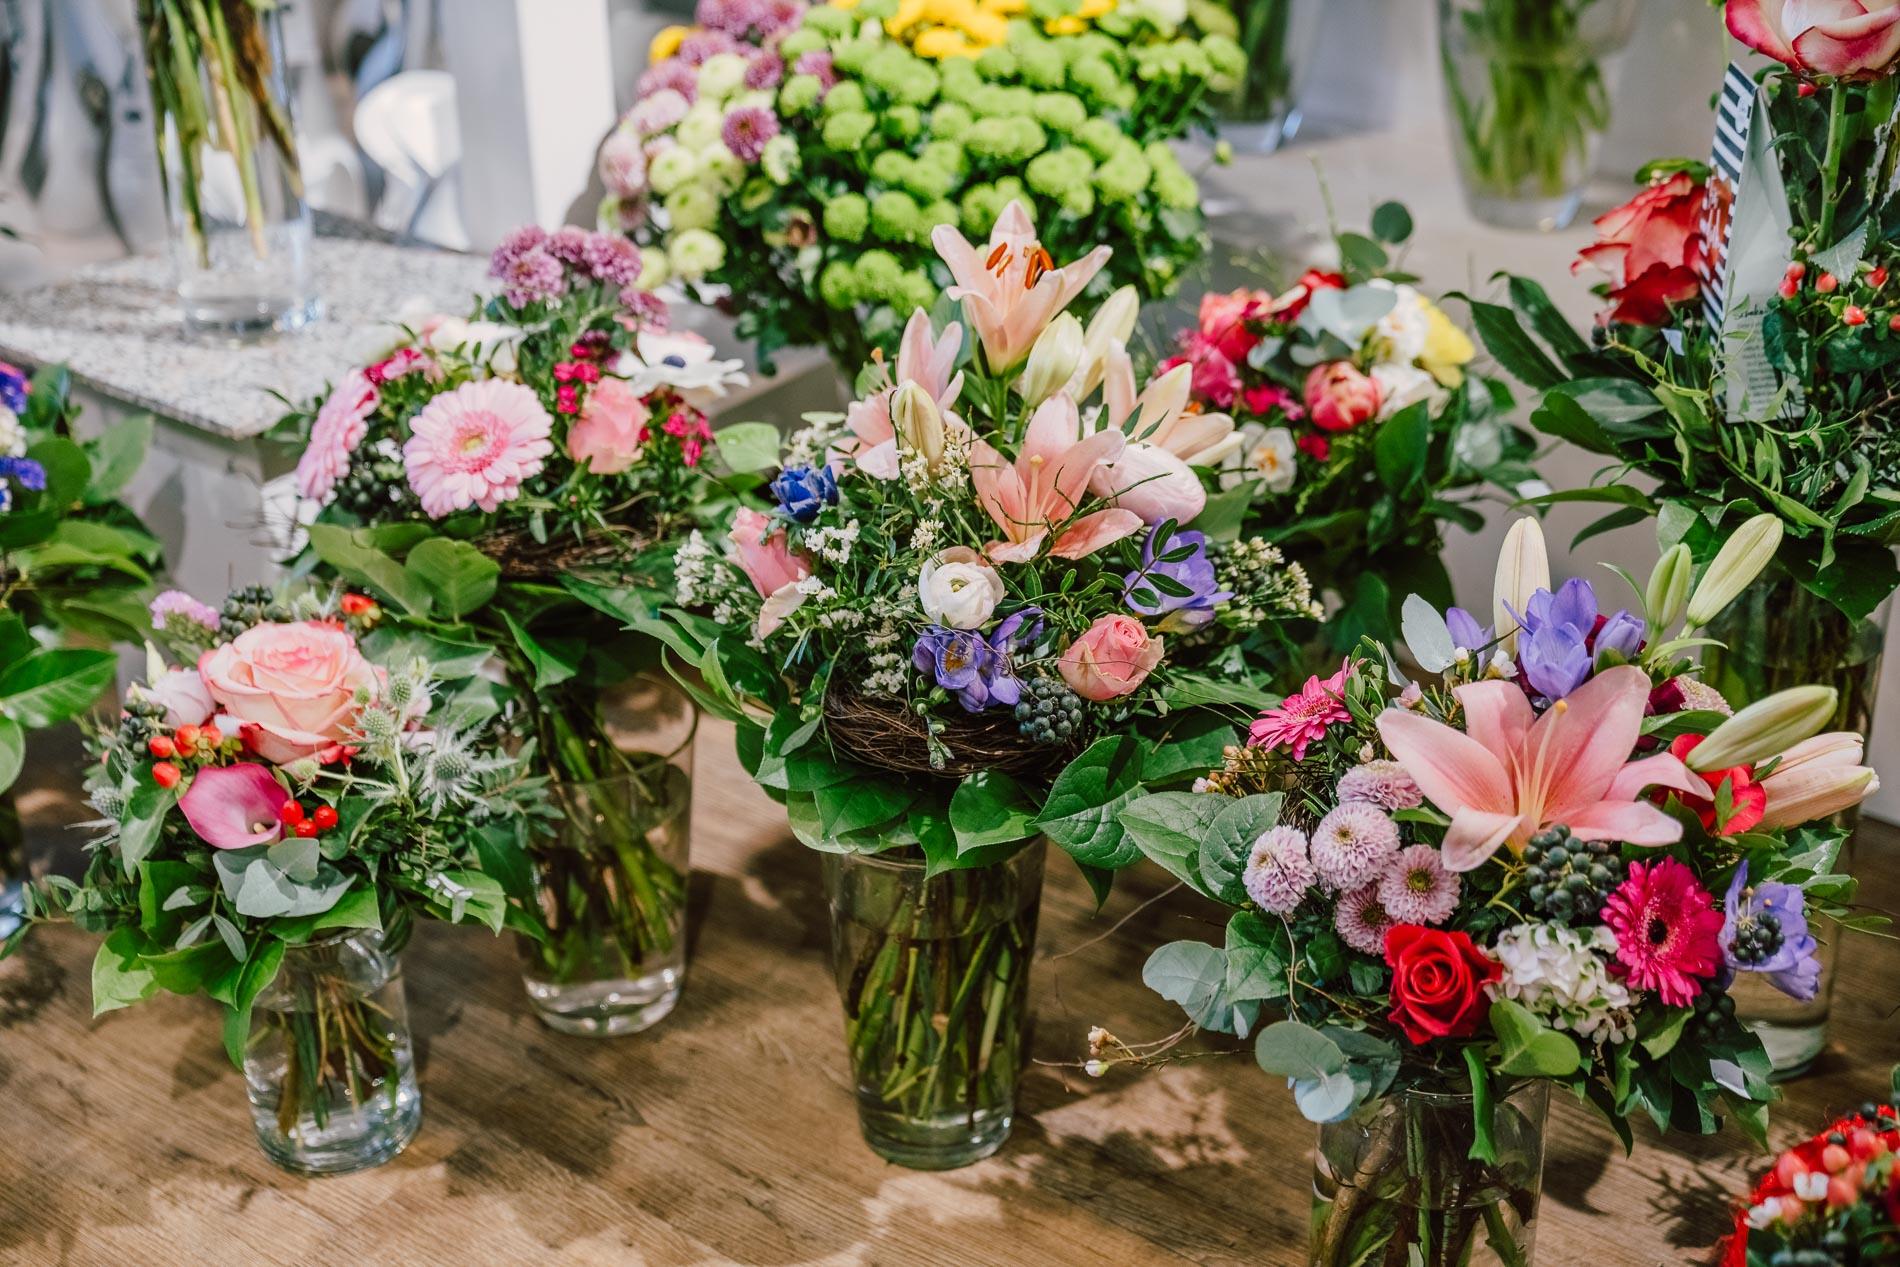 Blumen-Gaby-Strohmeier-titel-feb20-1